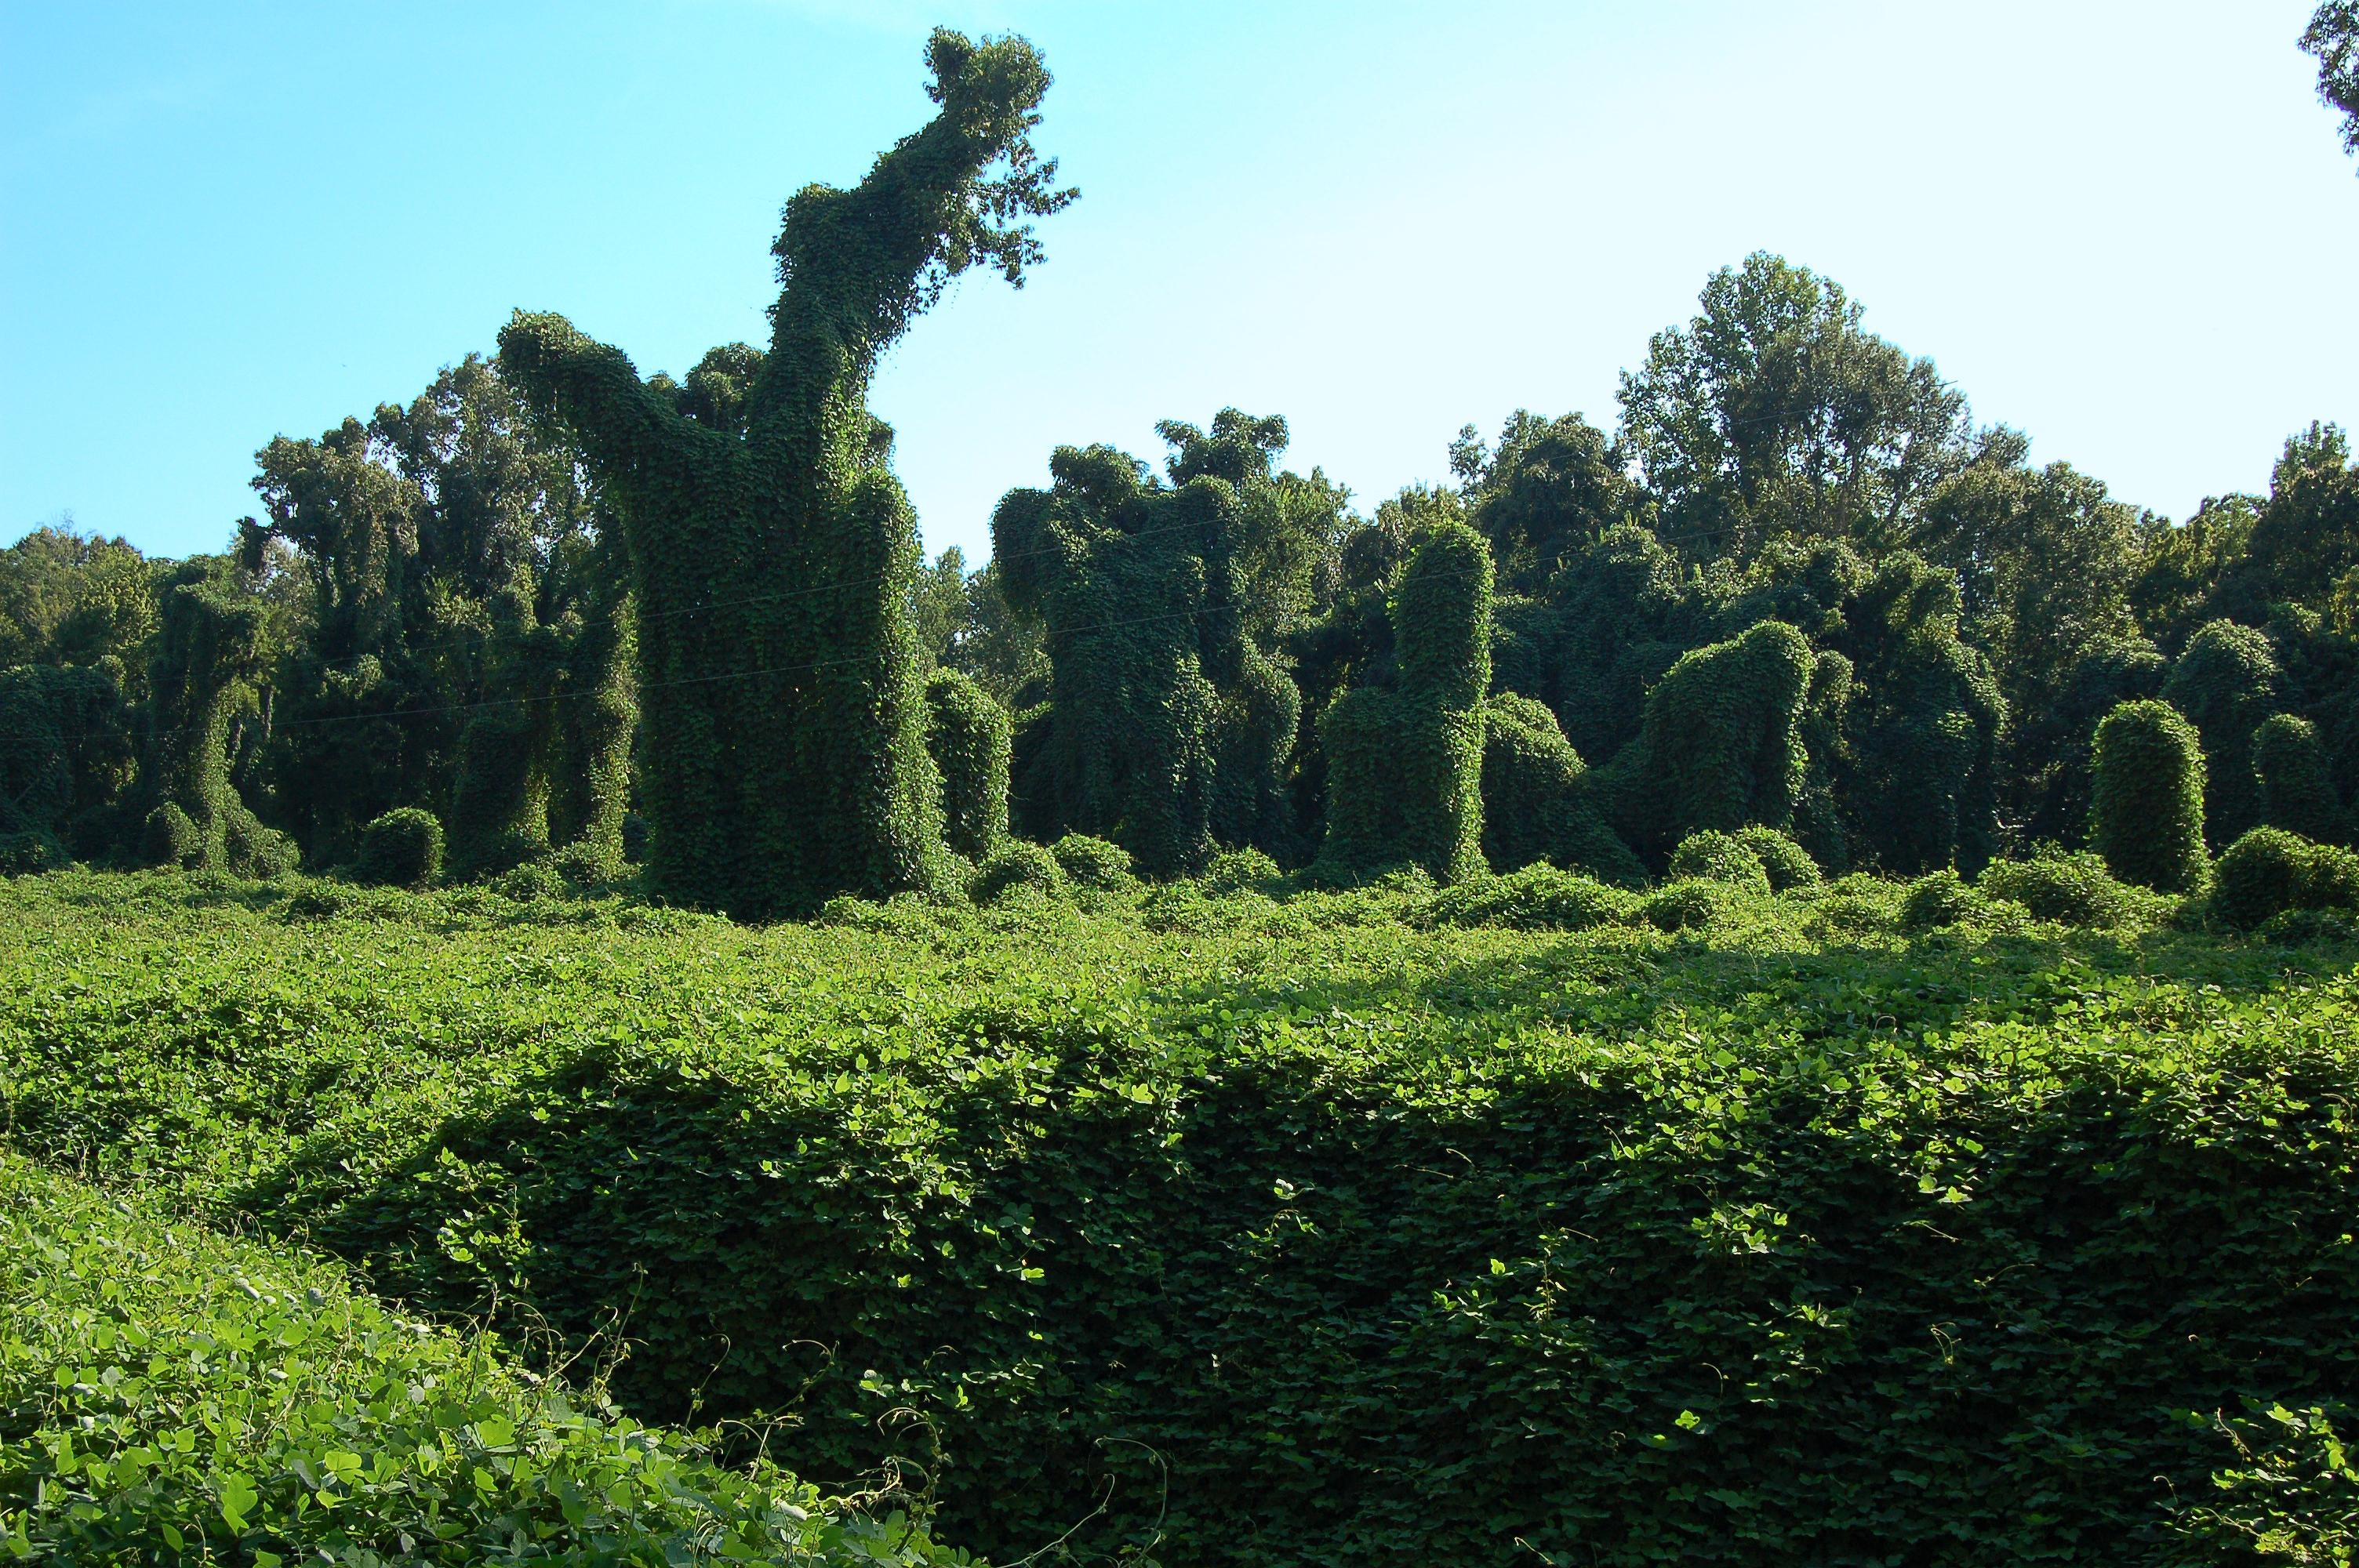 Kudzu plant - photo#13